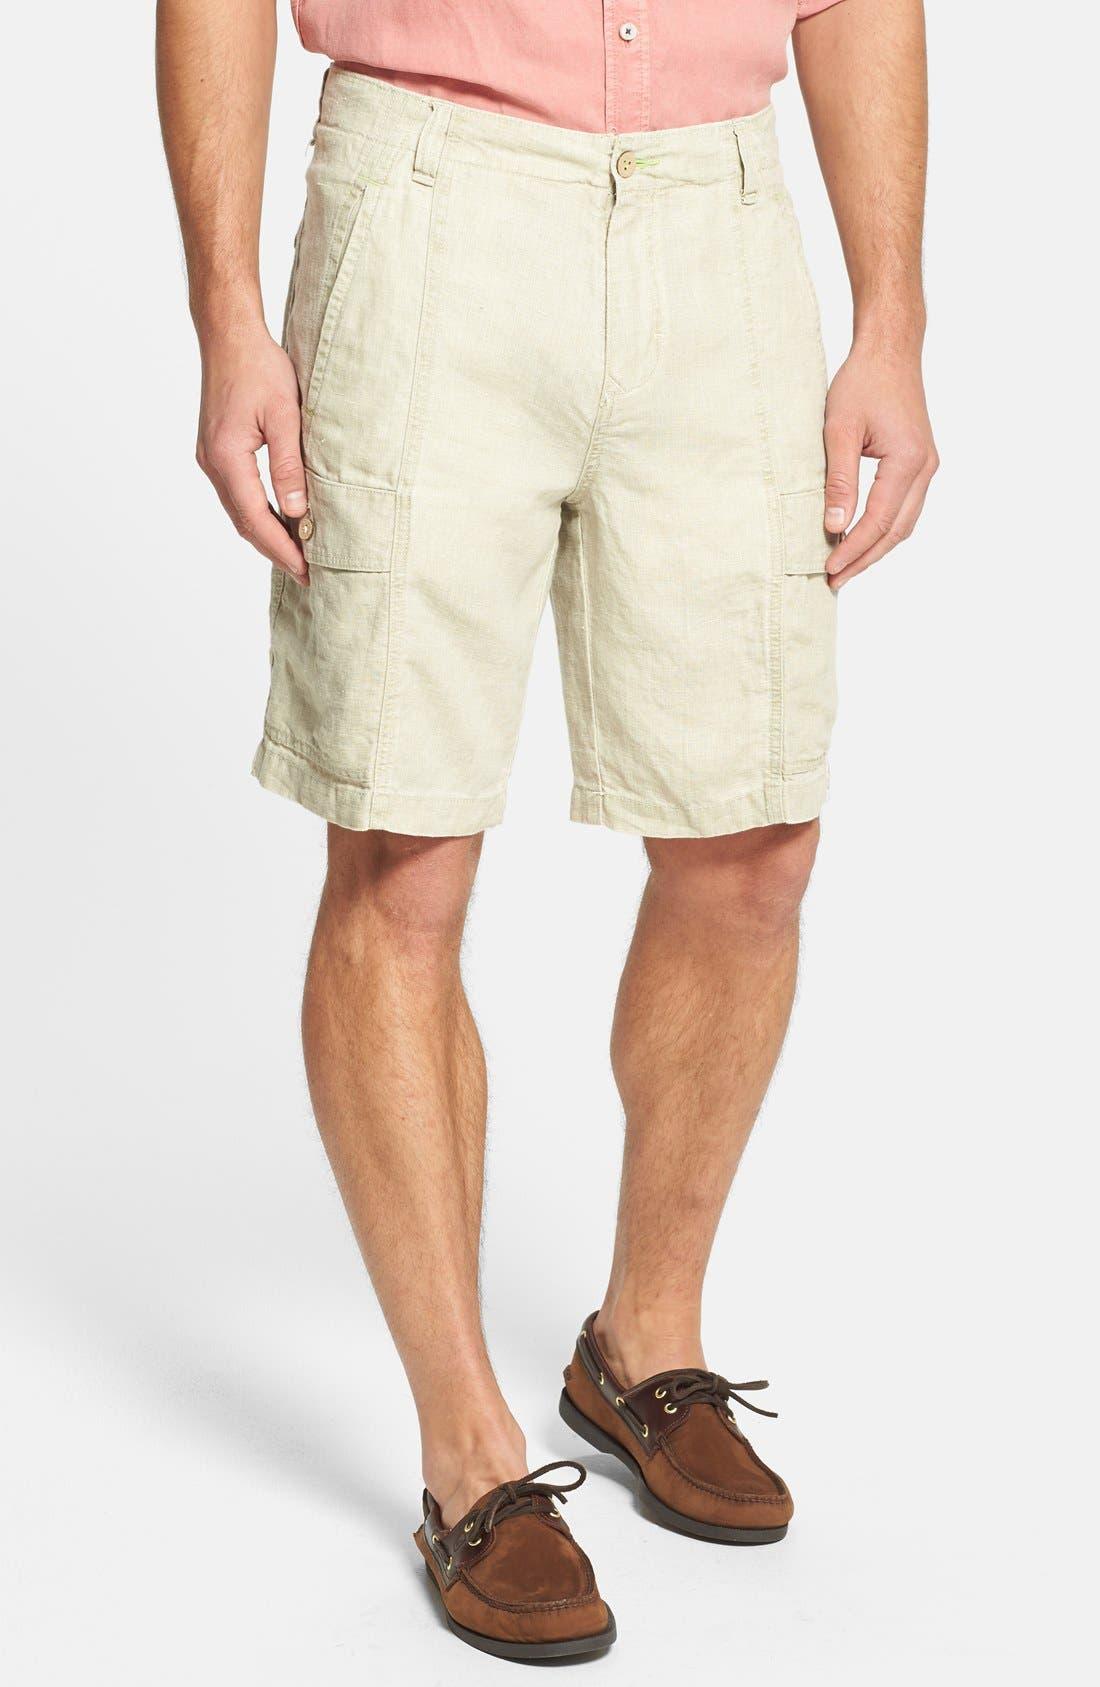 Alternate Image 1 Selected - Tommy Bahama 'Summerland Keys' Linen Cargo Shorts